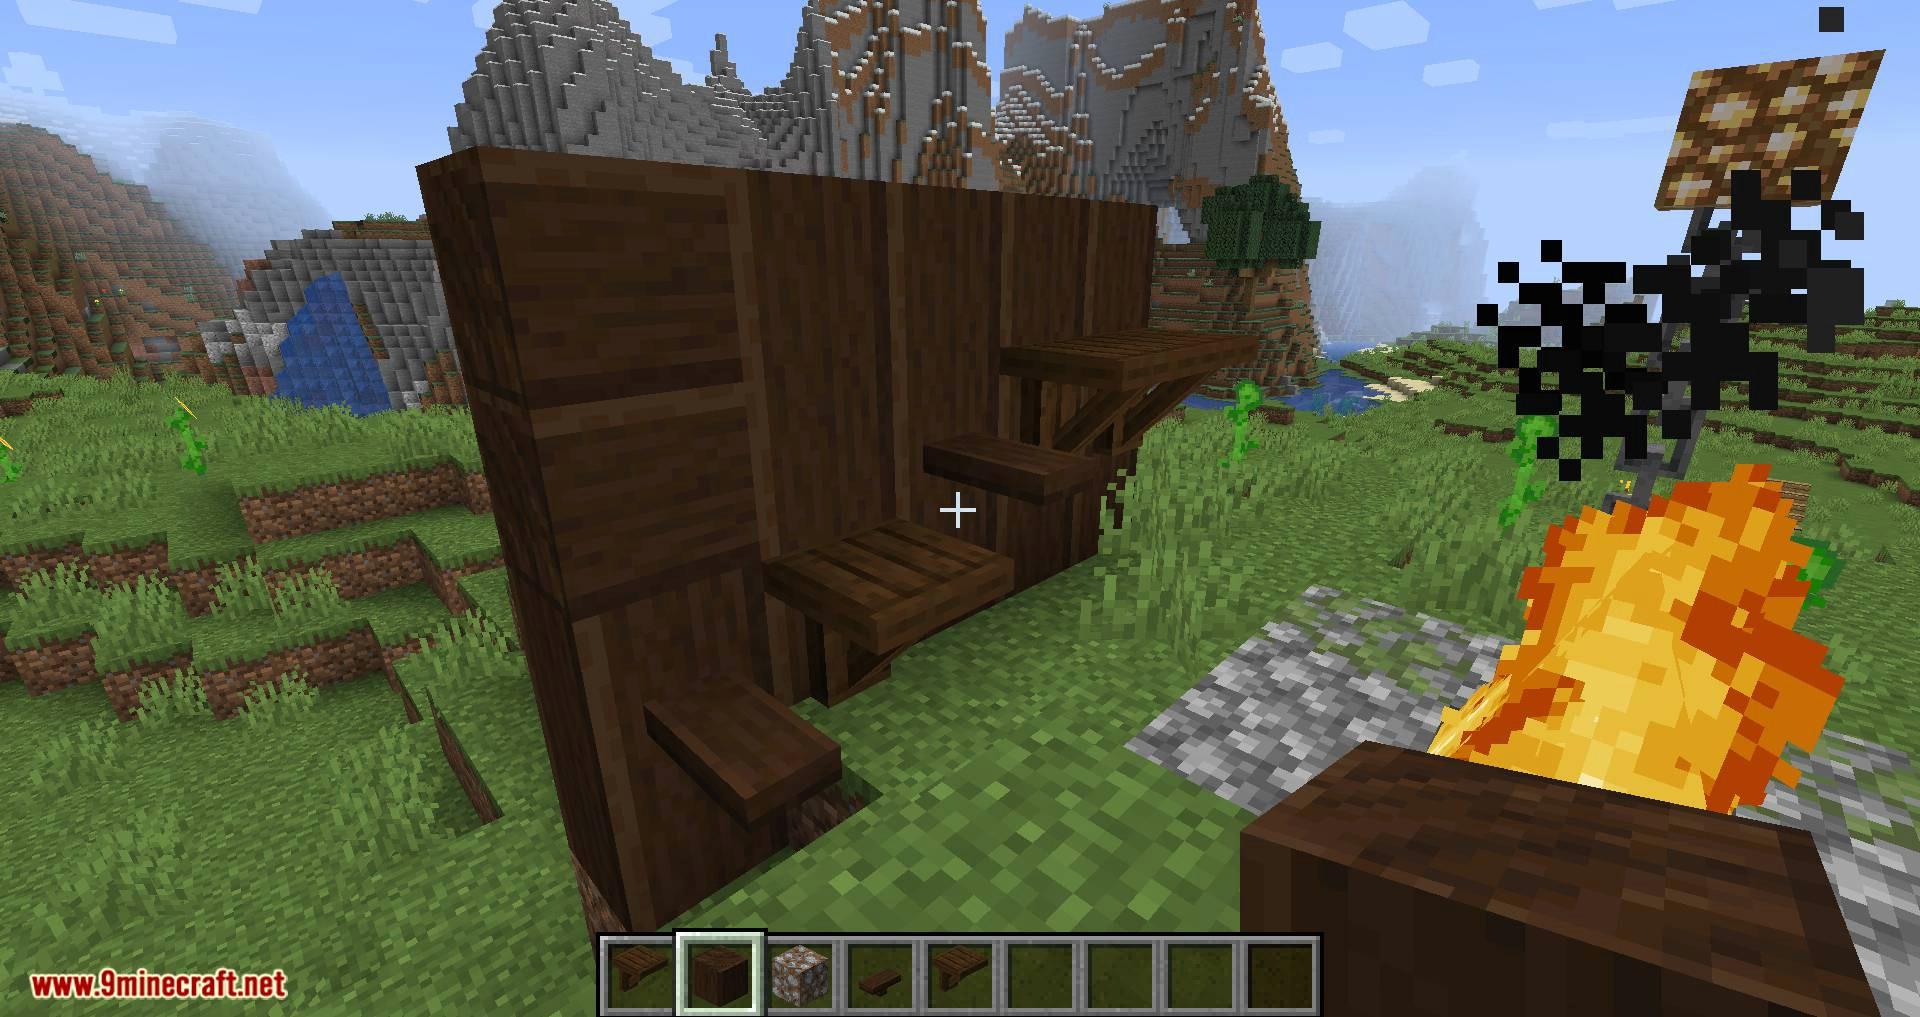 Decorative Blocks mod for minecraft 10